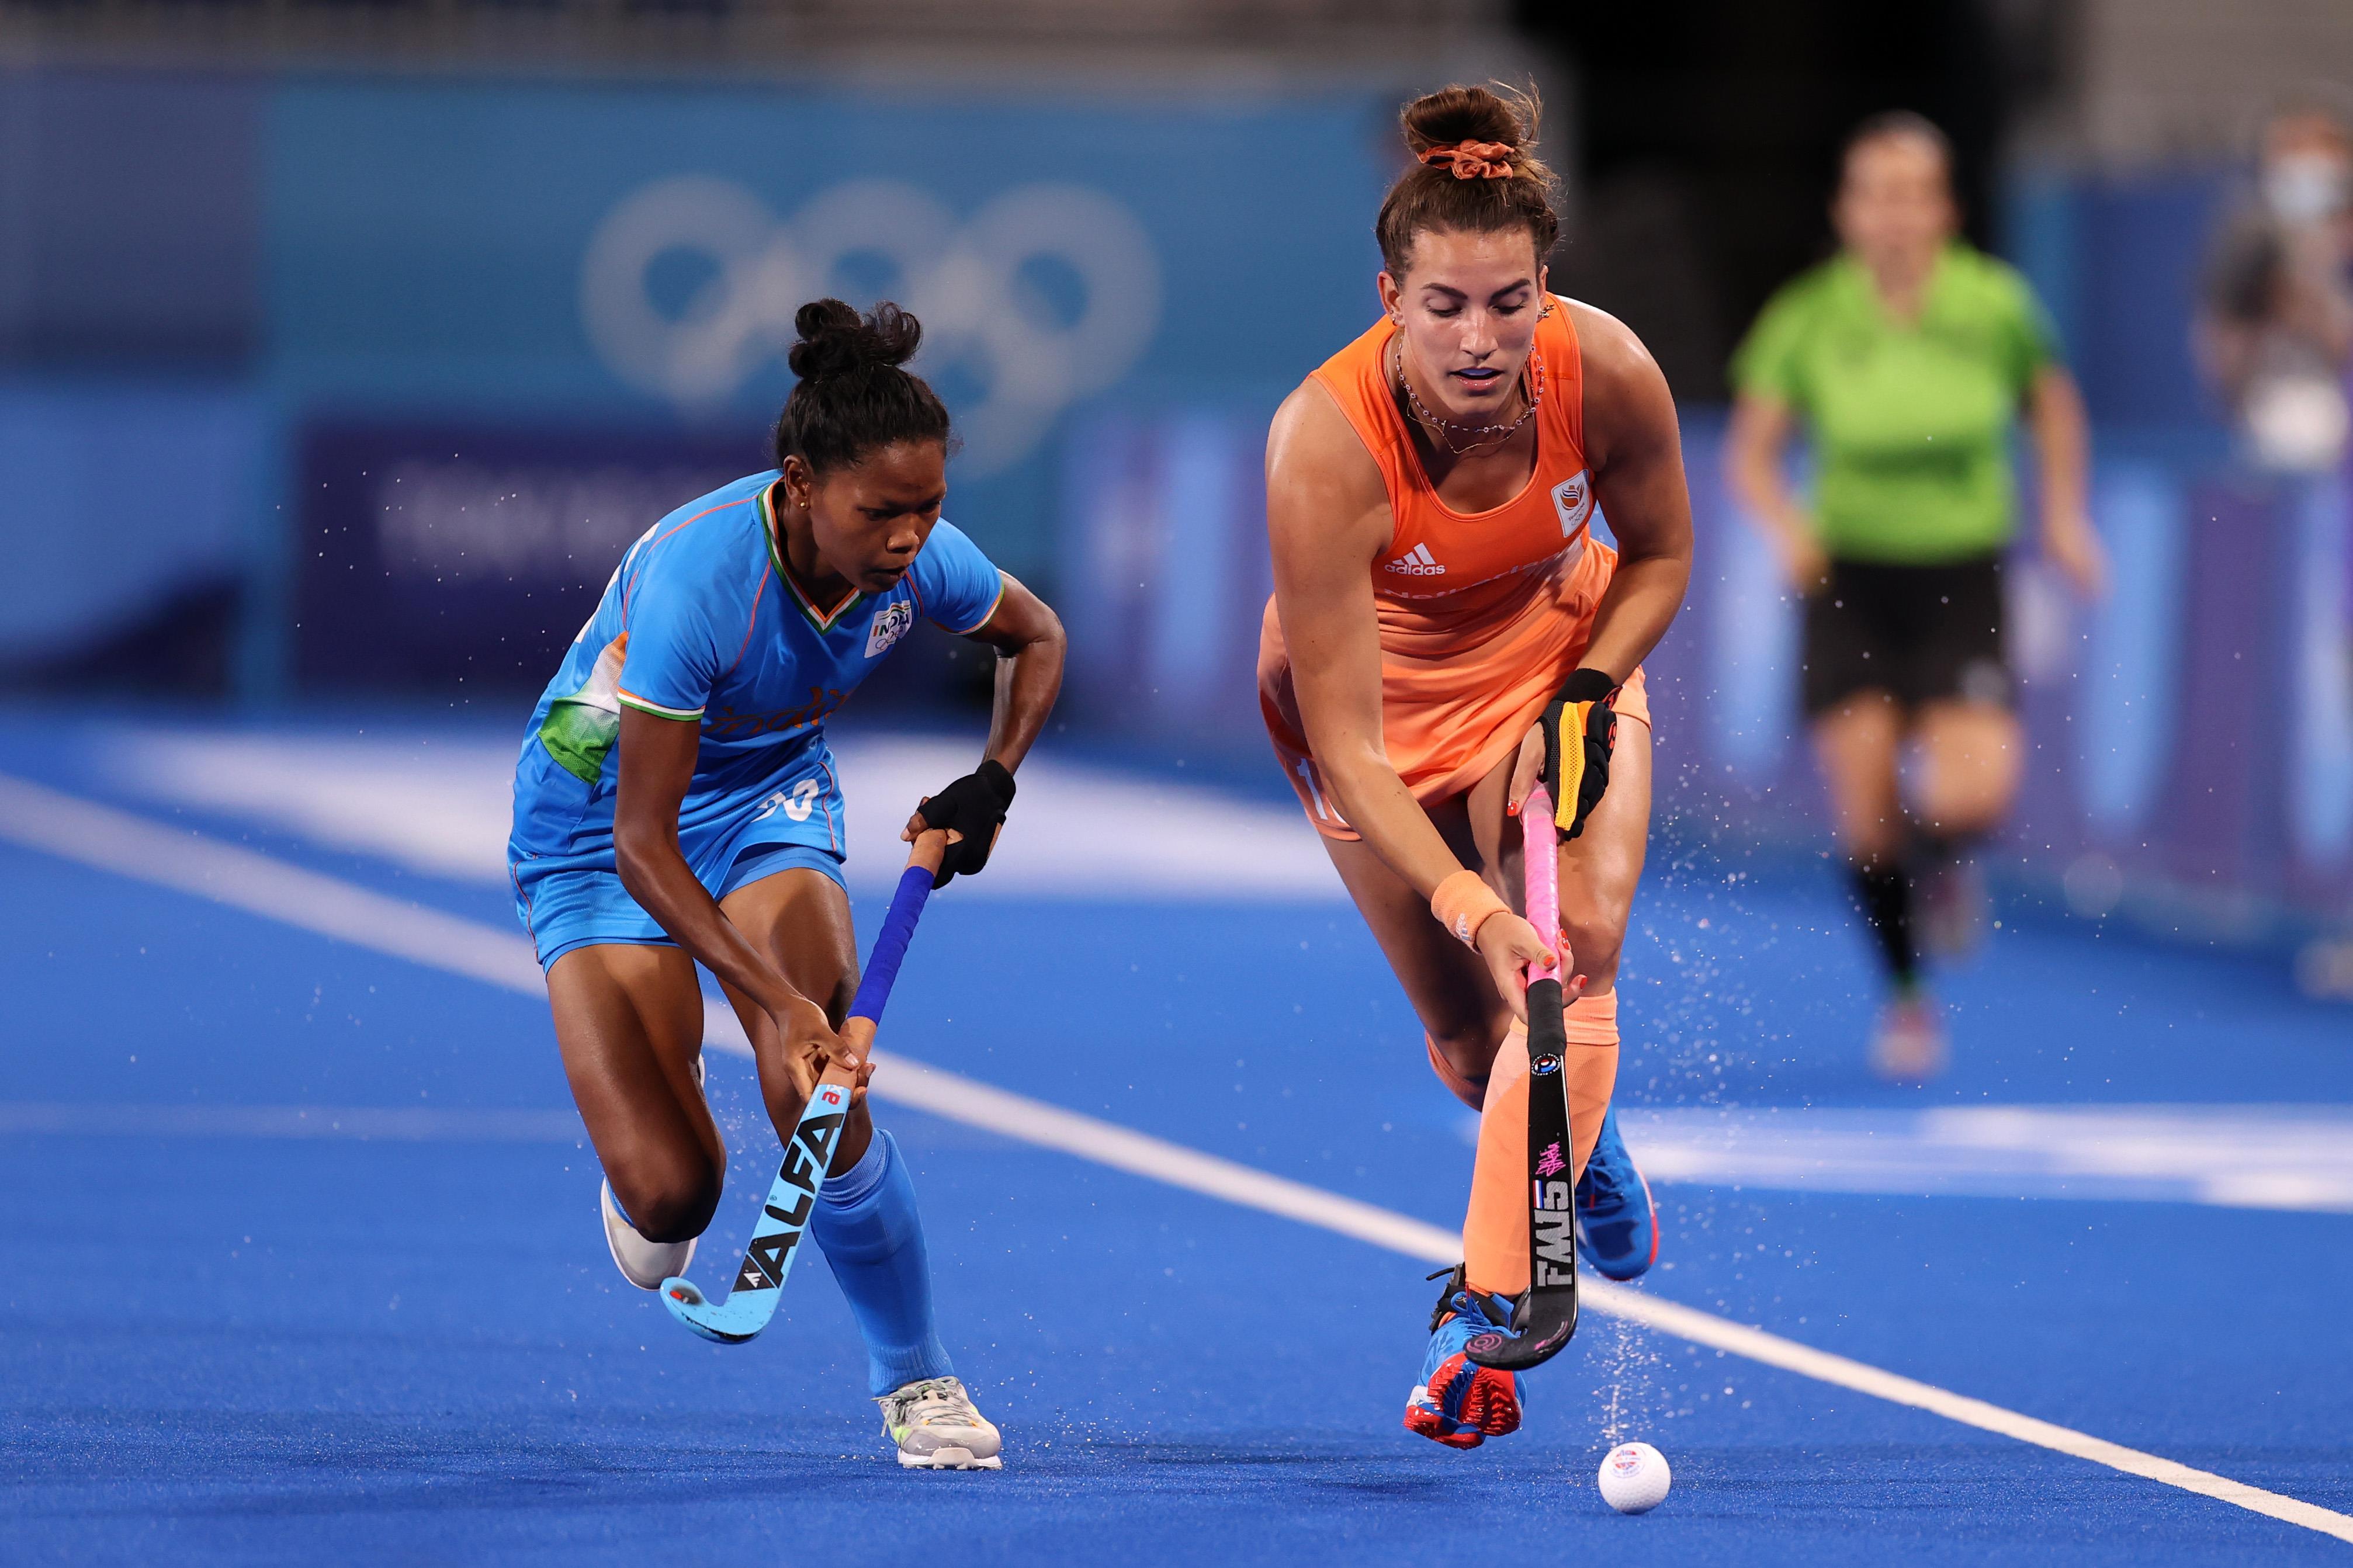 Women's Hockey Team Lose To Netherlands